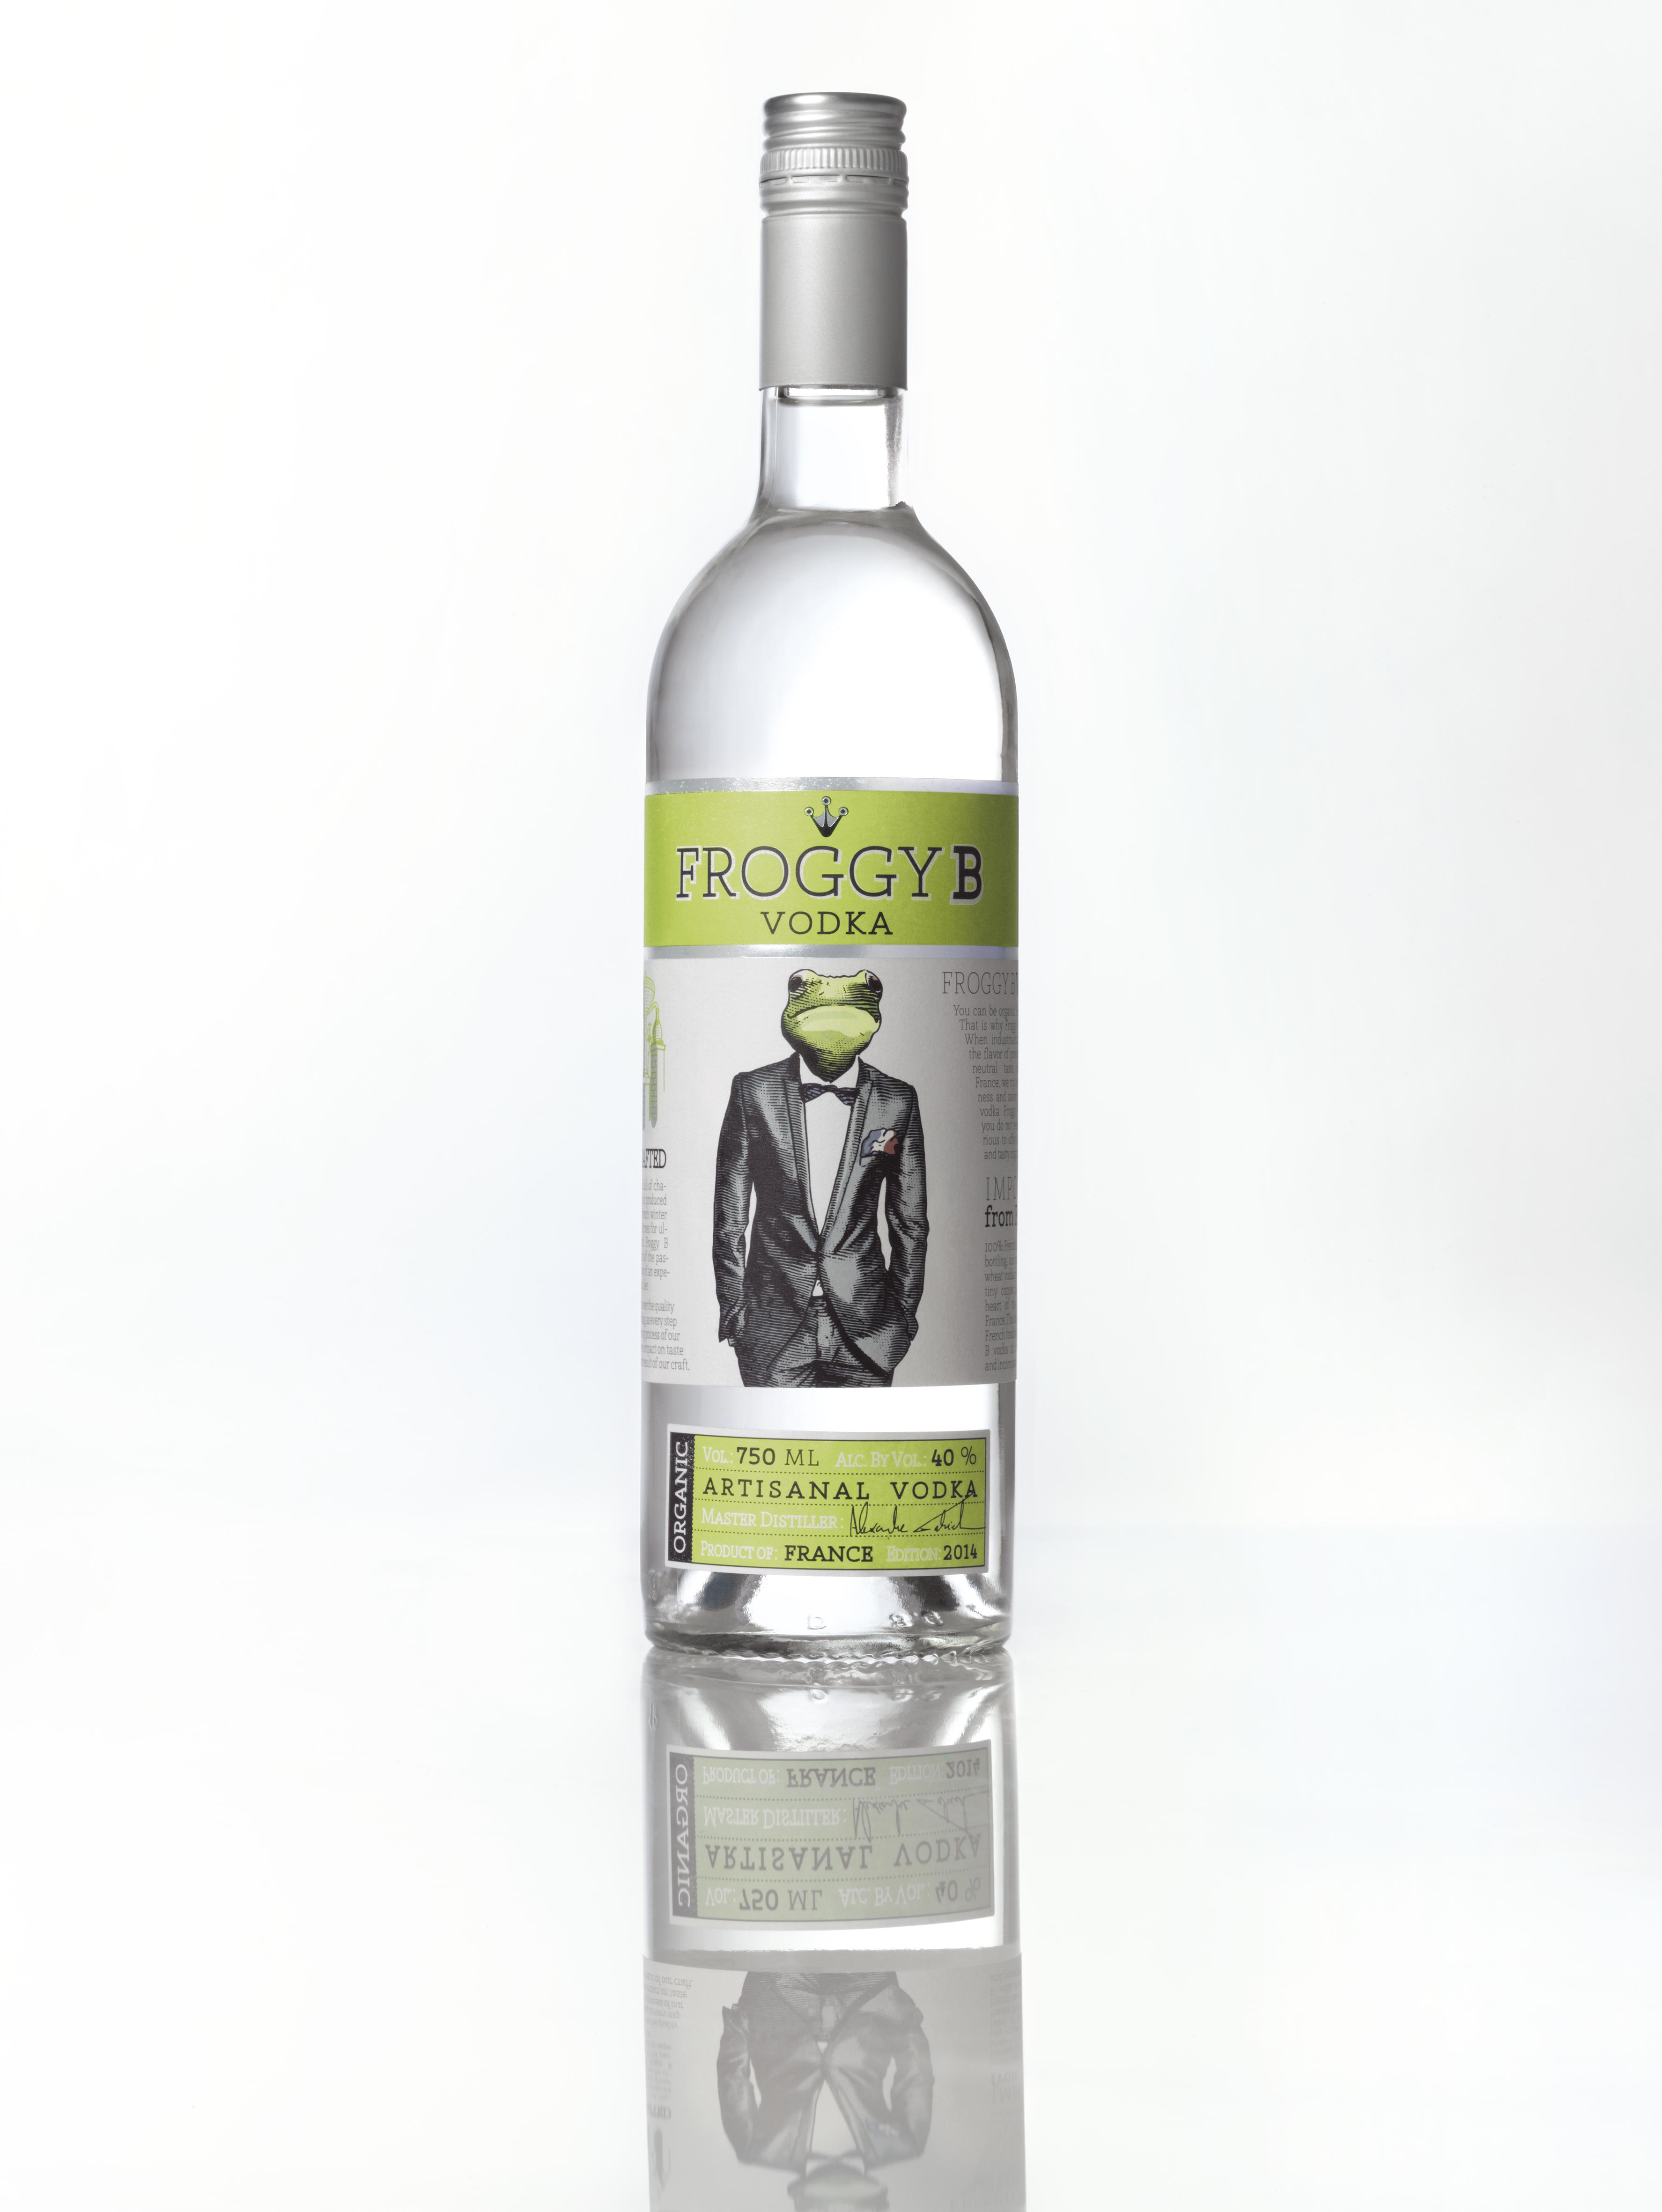 Maison Ferrand Froggy B Vodka